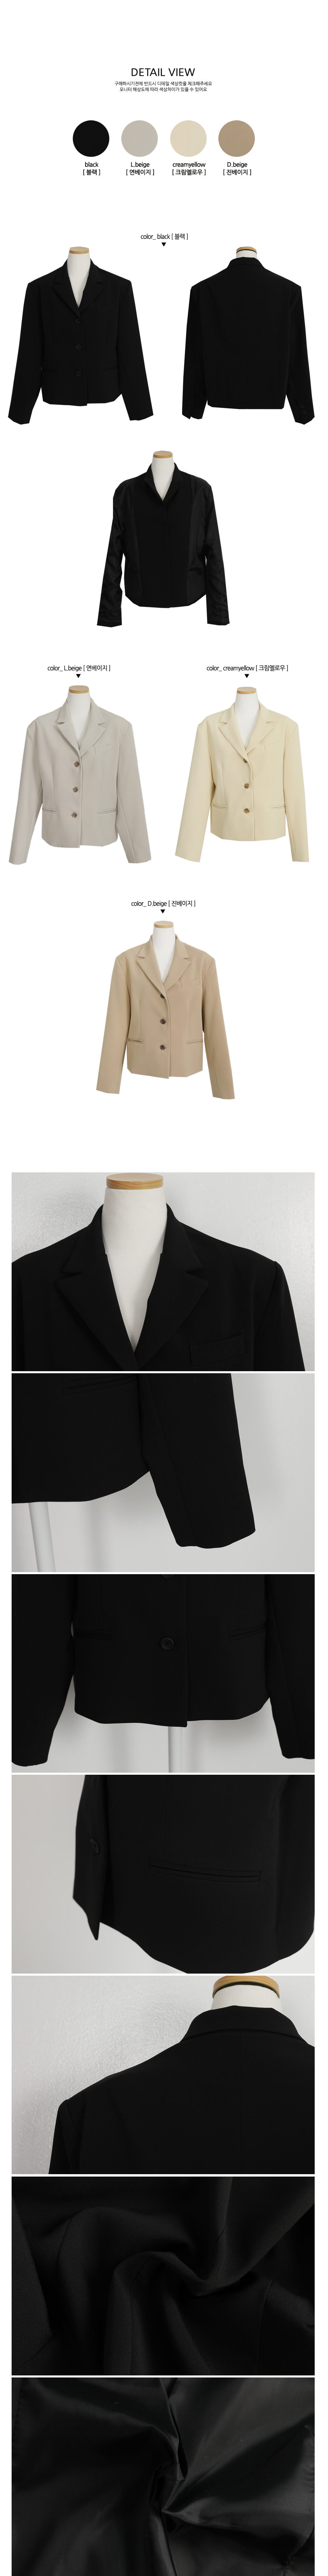 Blia Crop Jacket